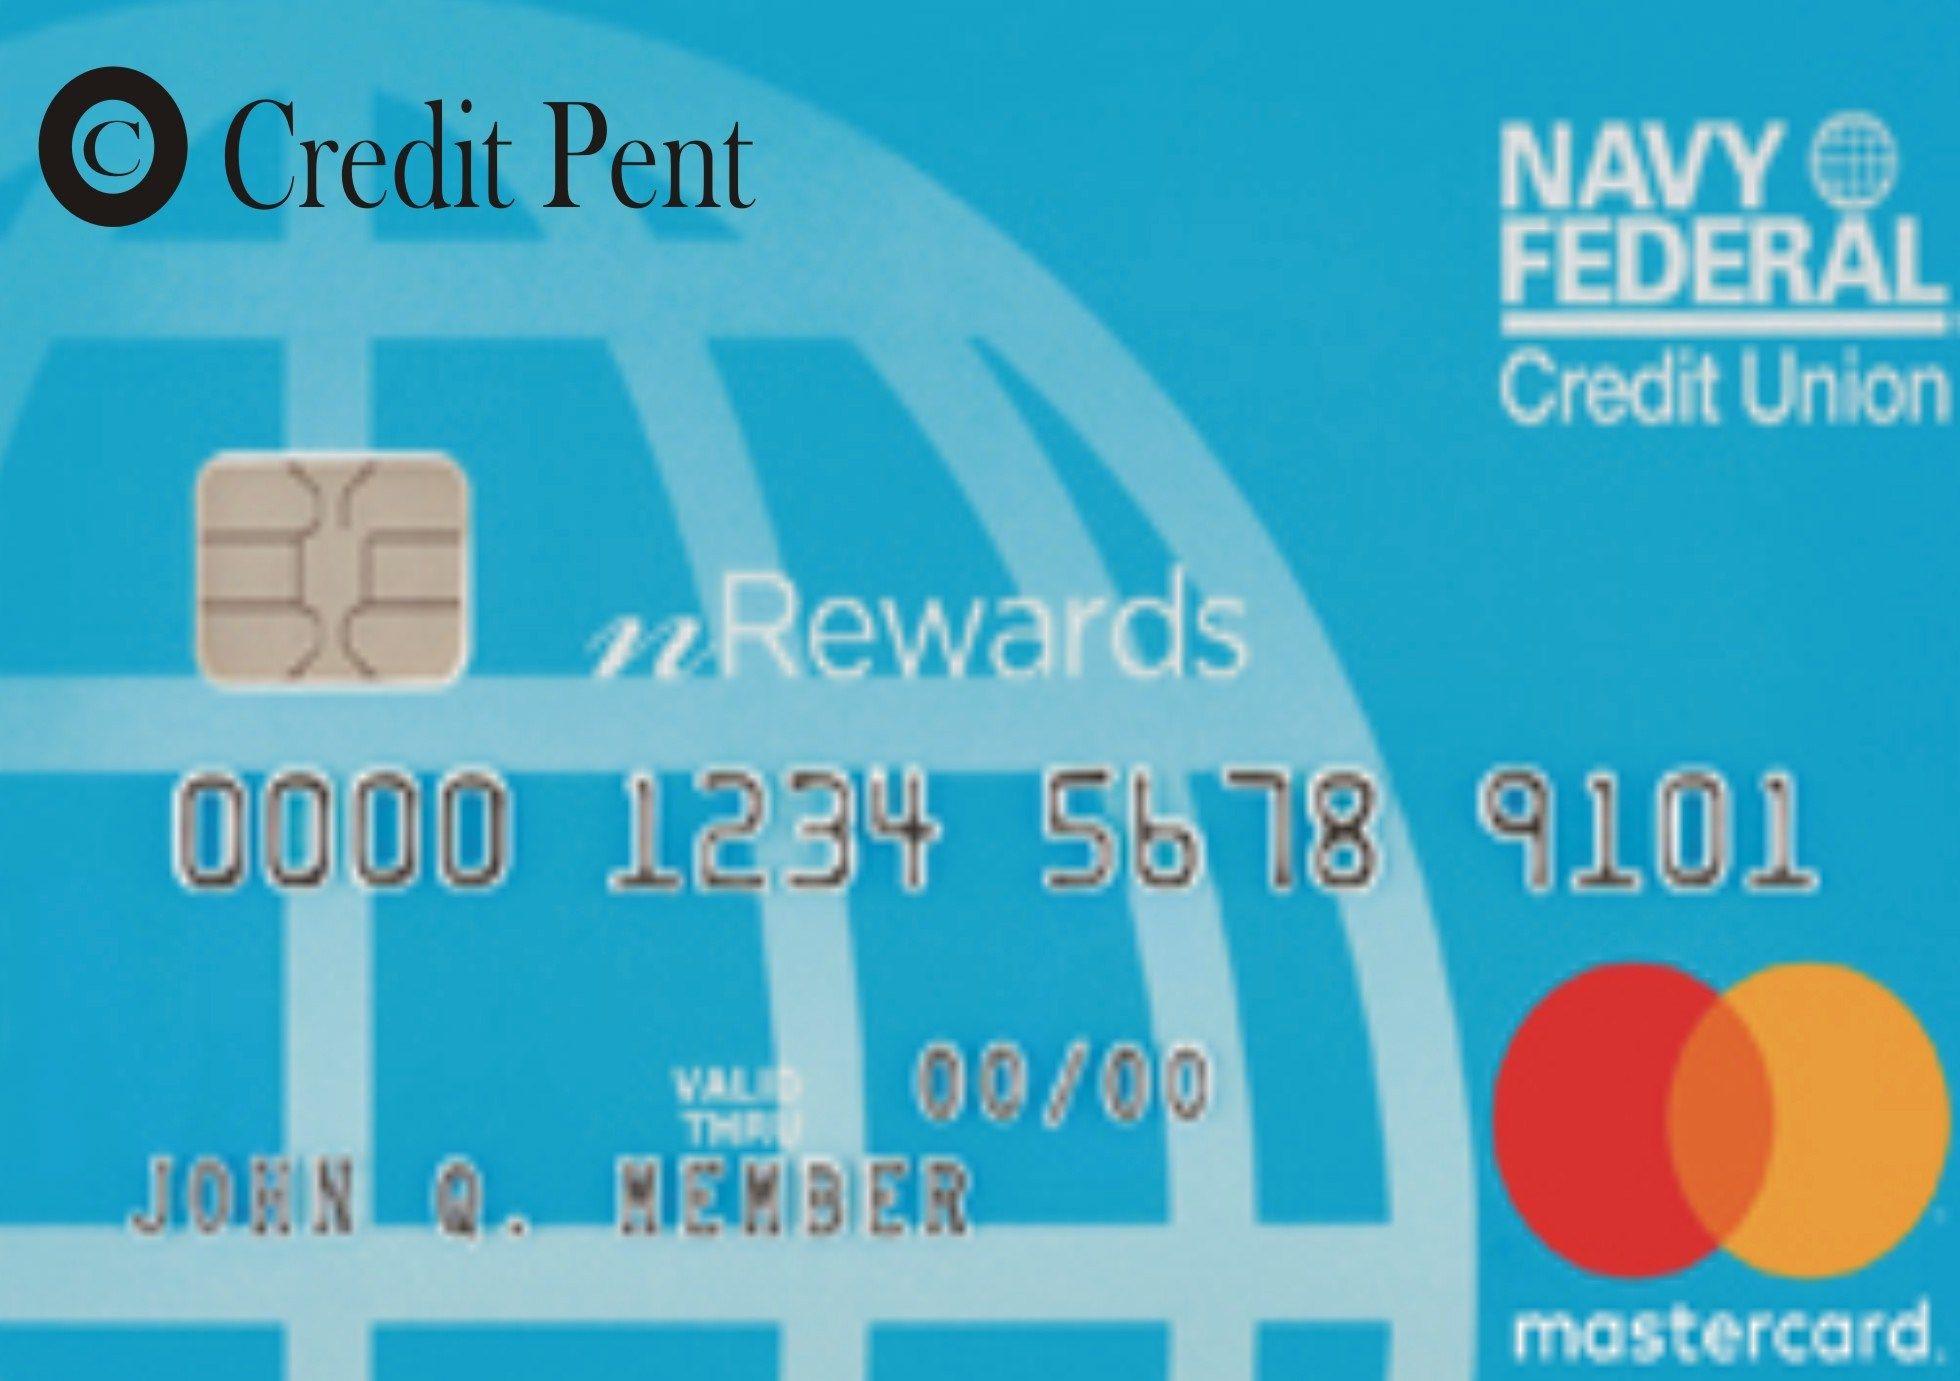 Nrewards Secured Credit Card Review Military Credit Card Benefits Credit Card Reviews Secure Credit Card Credit Card Benefits